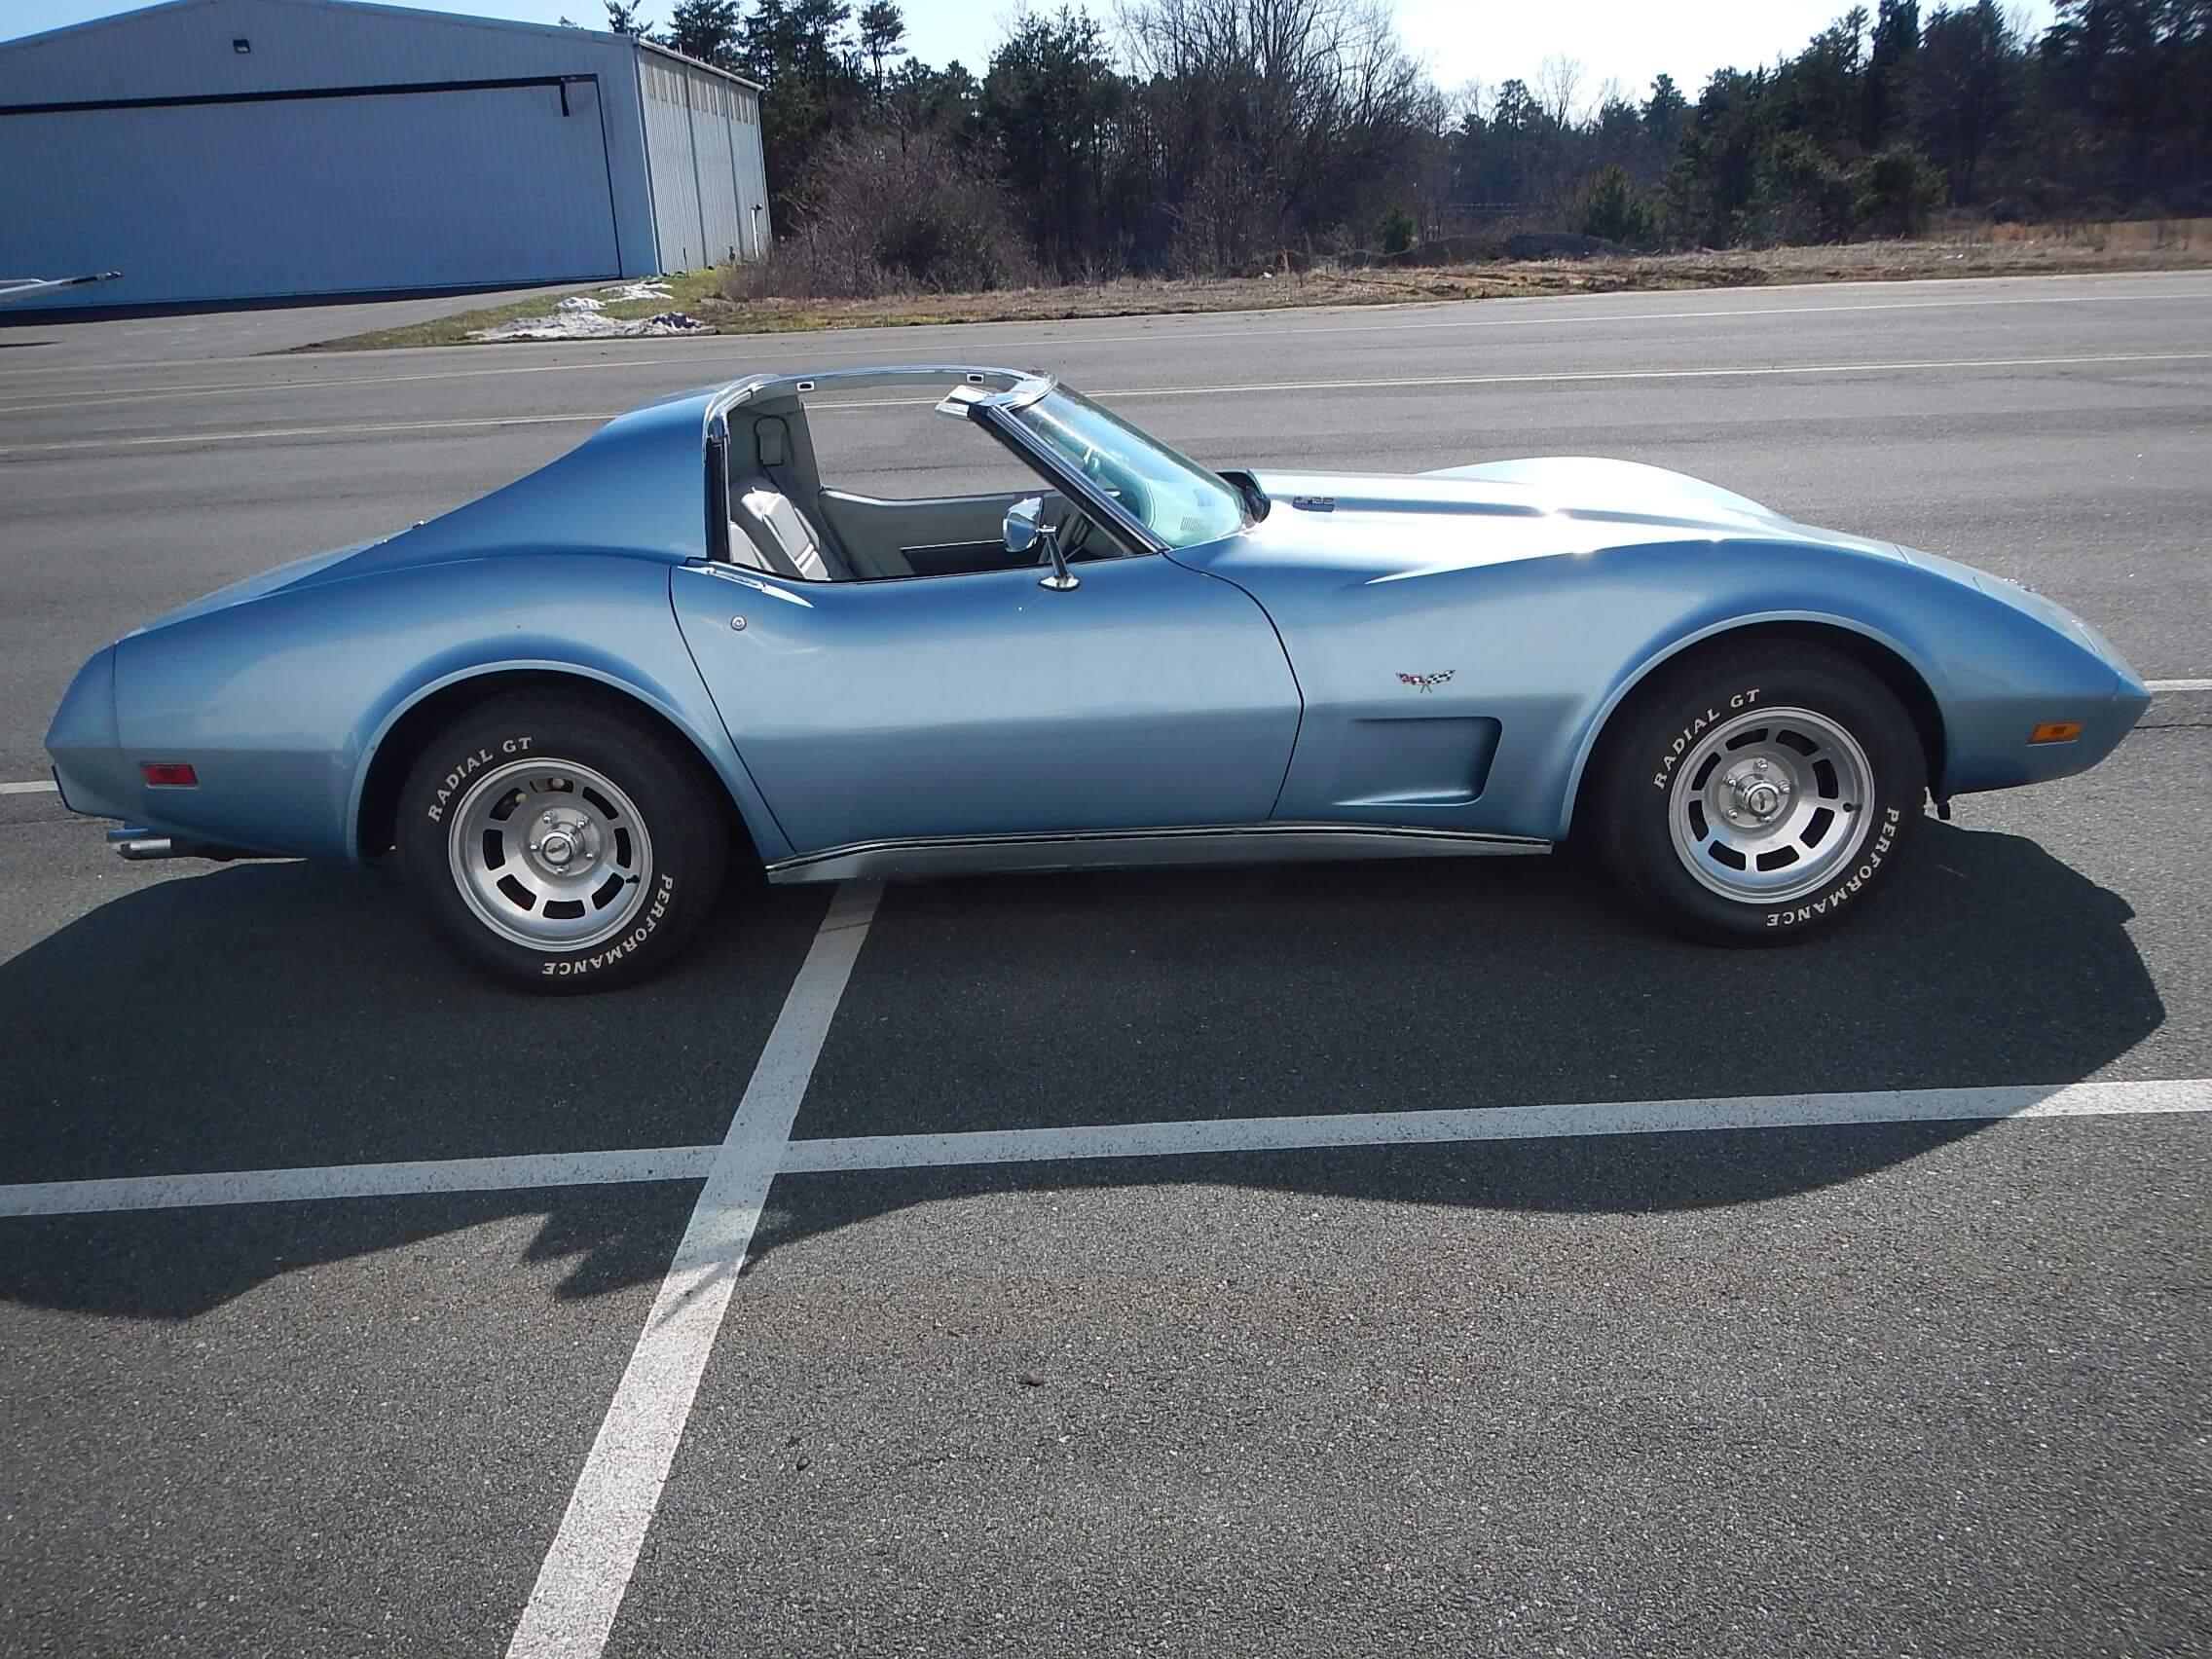 1977 Corvette Coupe restoration 42.JPG